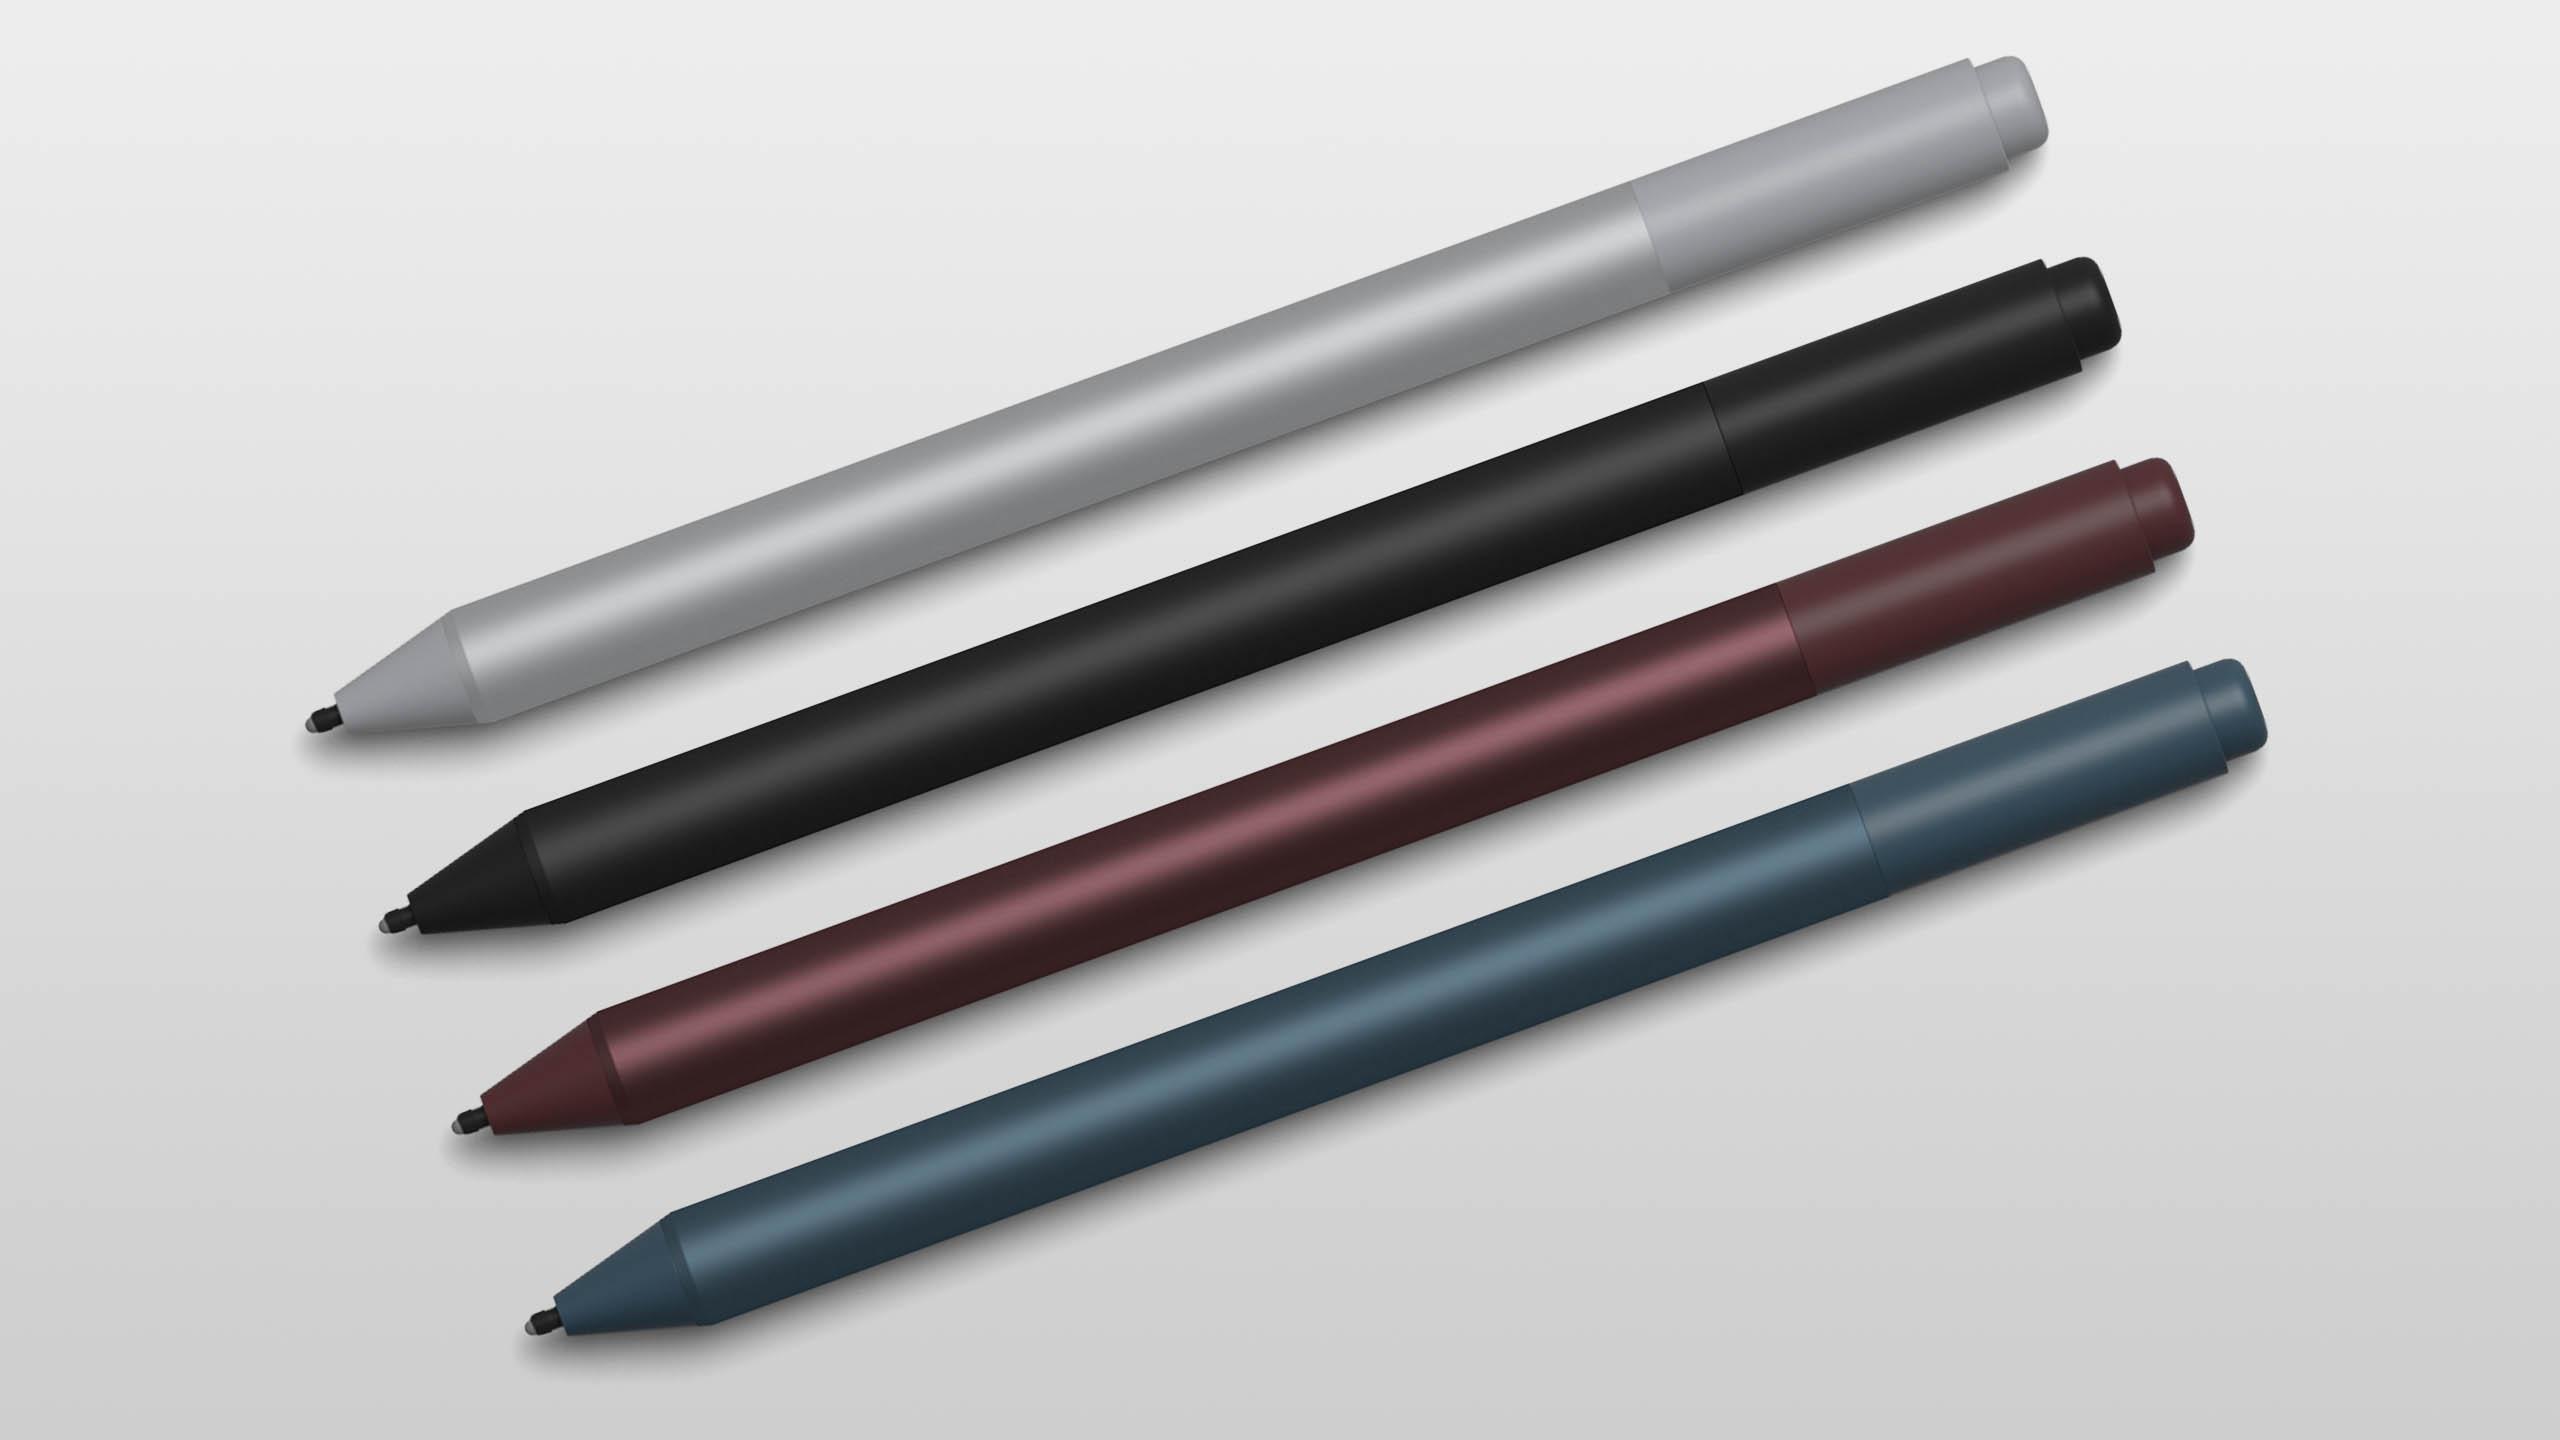 Surface Zubehoer Stifte